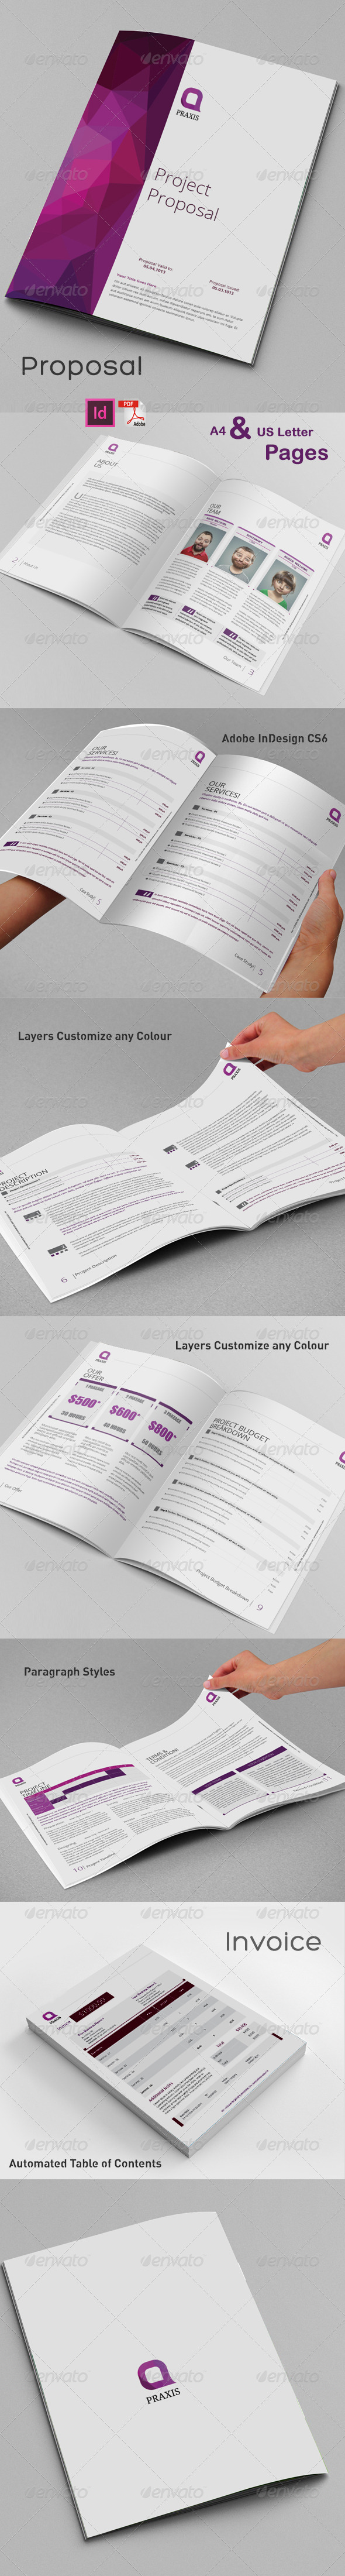 GraphicRiver Proposal Template 8540573